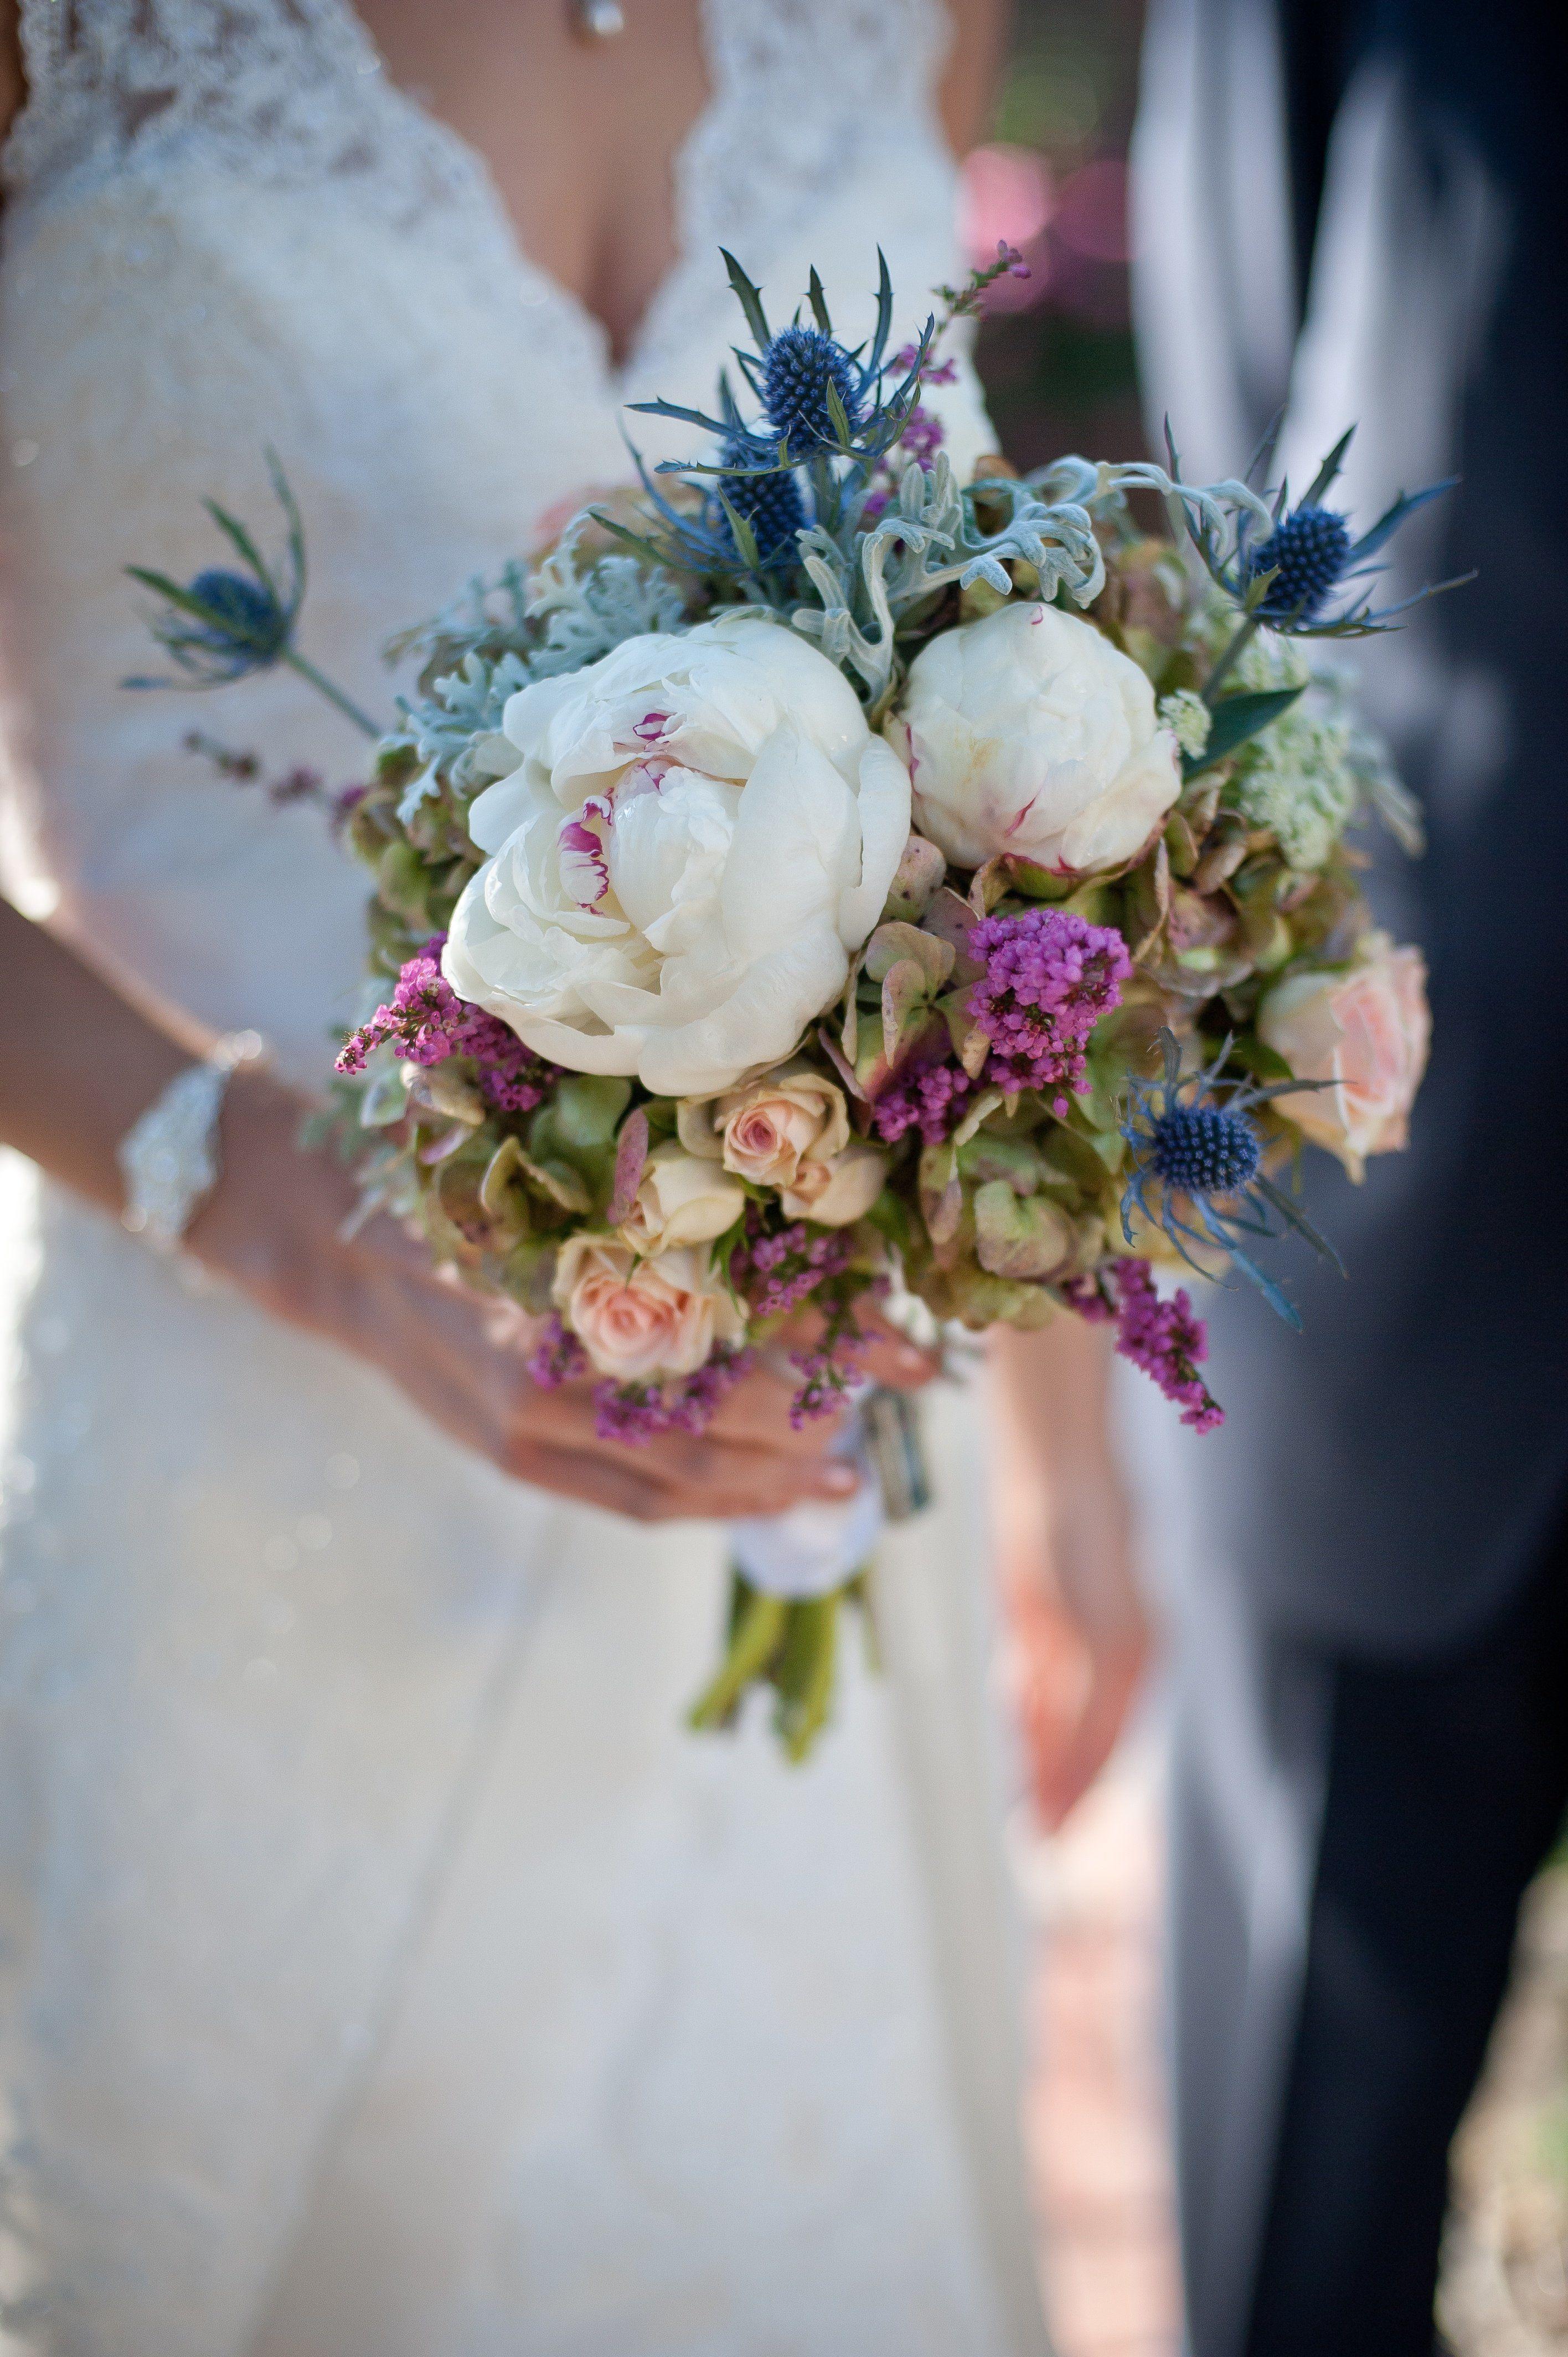 wedding flowers shop photo - 1